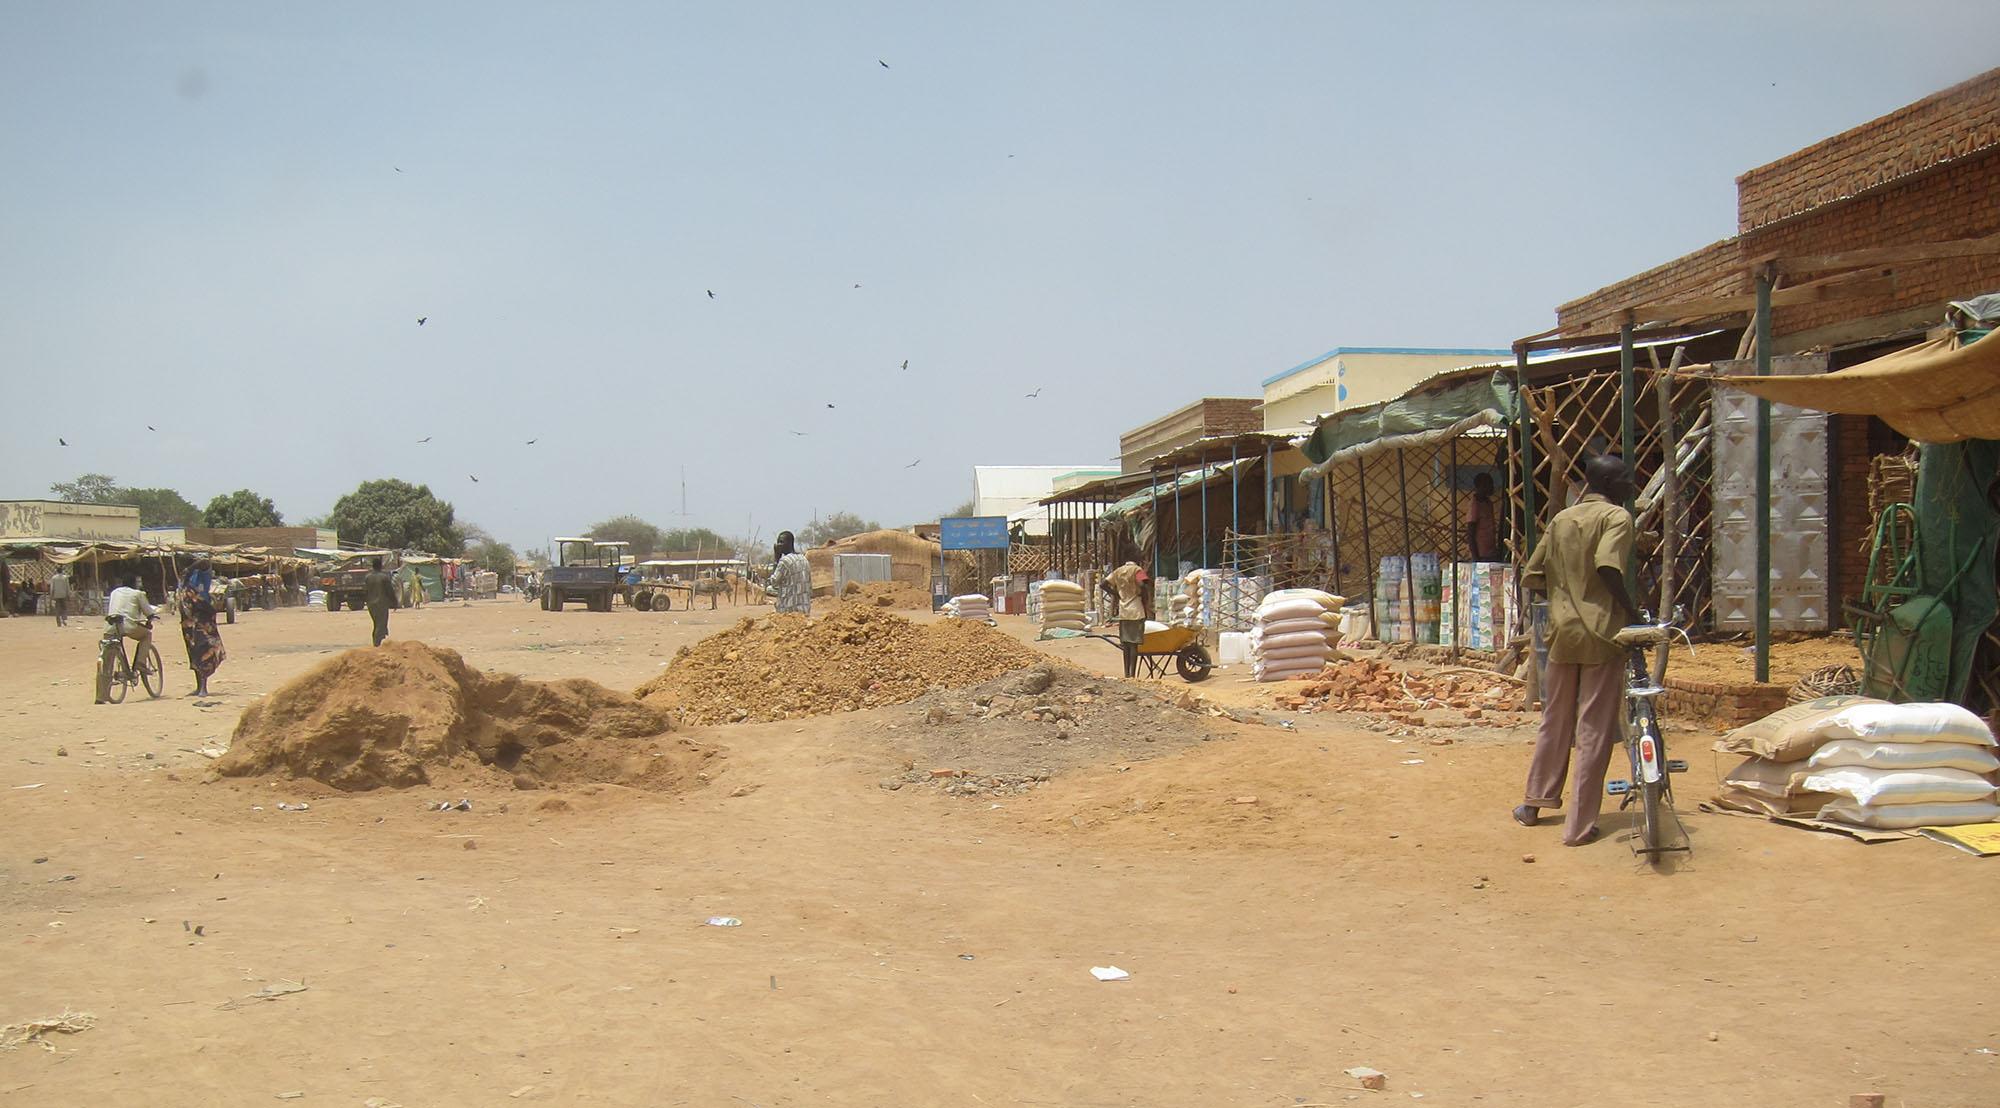 The crisis-ridden Horn of Africa – a bottomless pit?